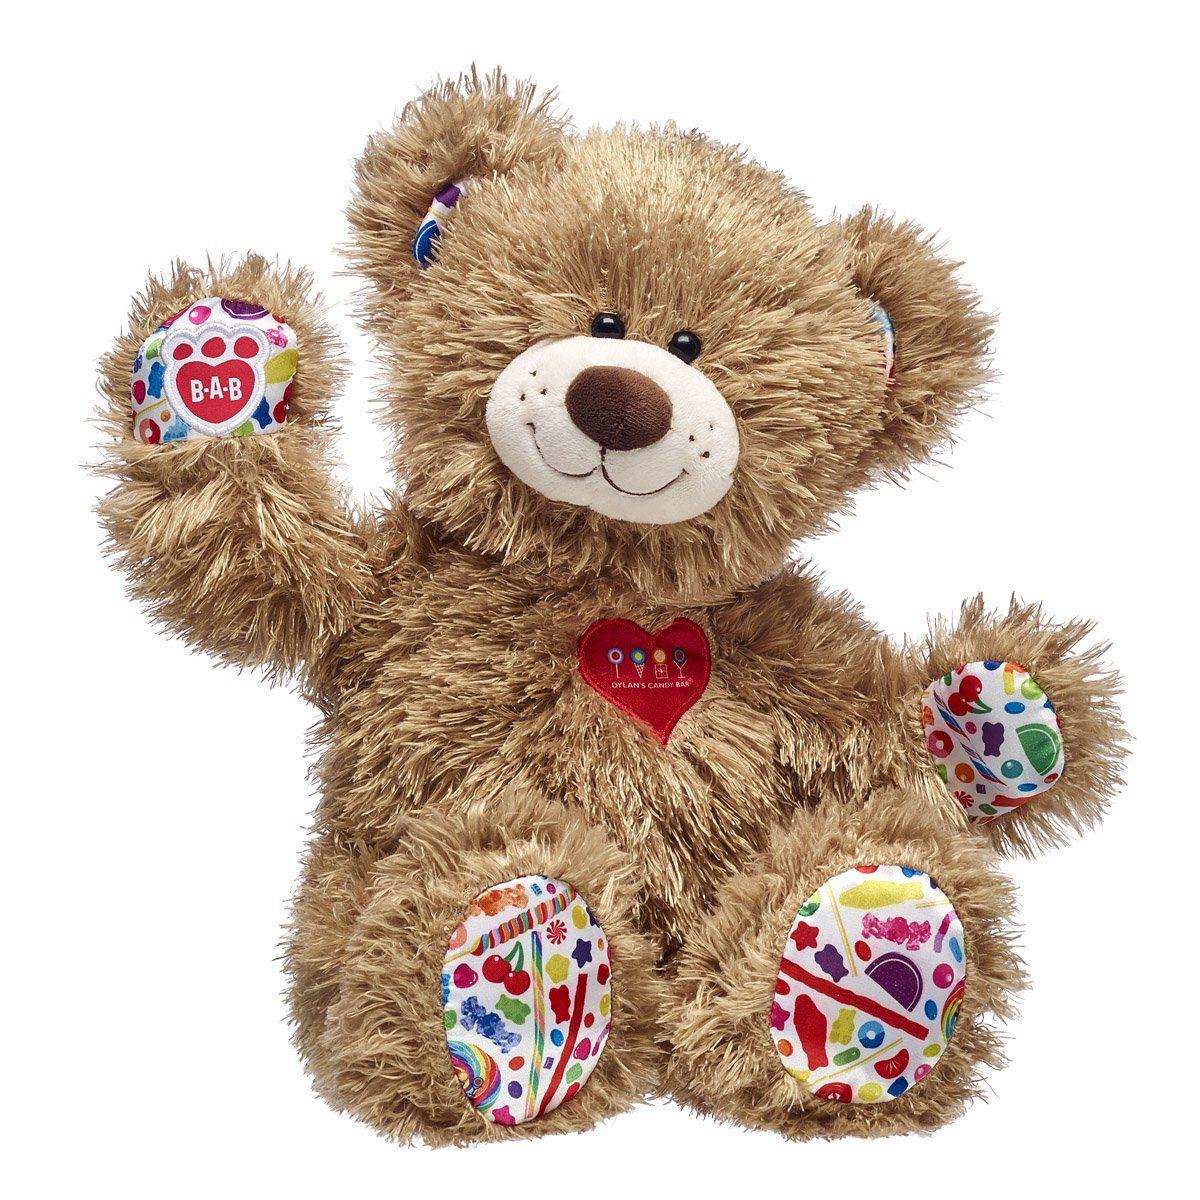 Build-A-Bear 16 in TATTY TEDDY BEAR Teddy Plush Me To You UK Exclusive